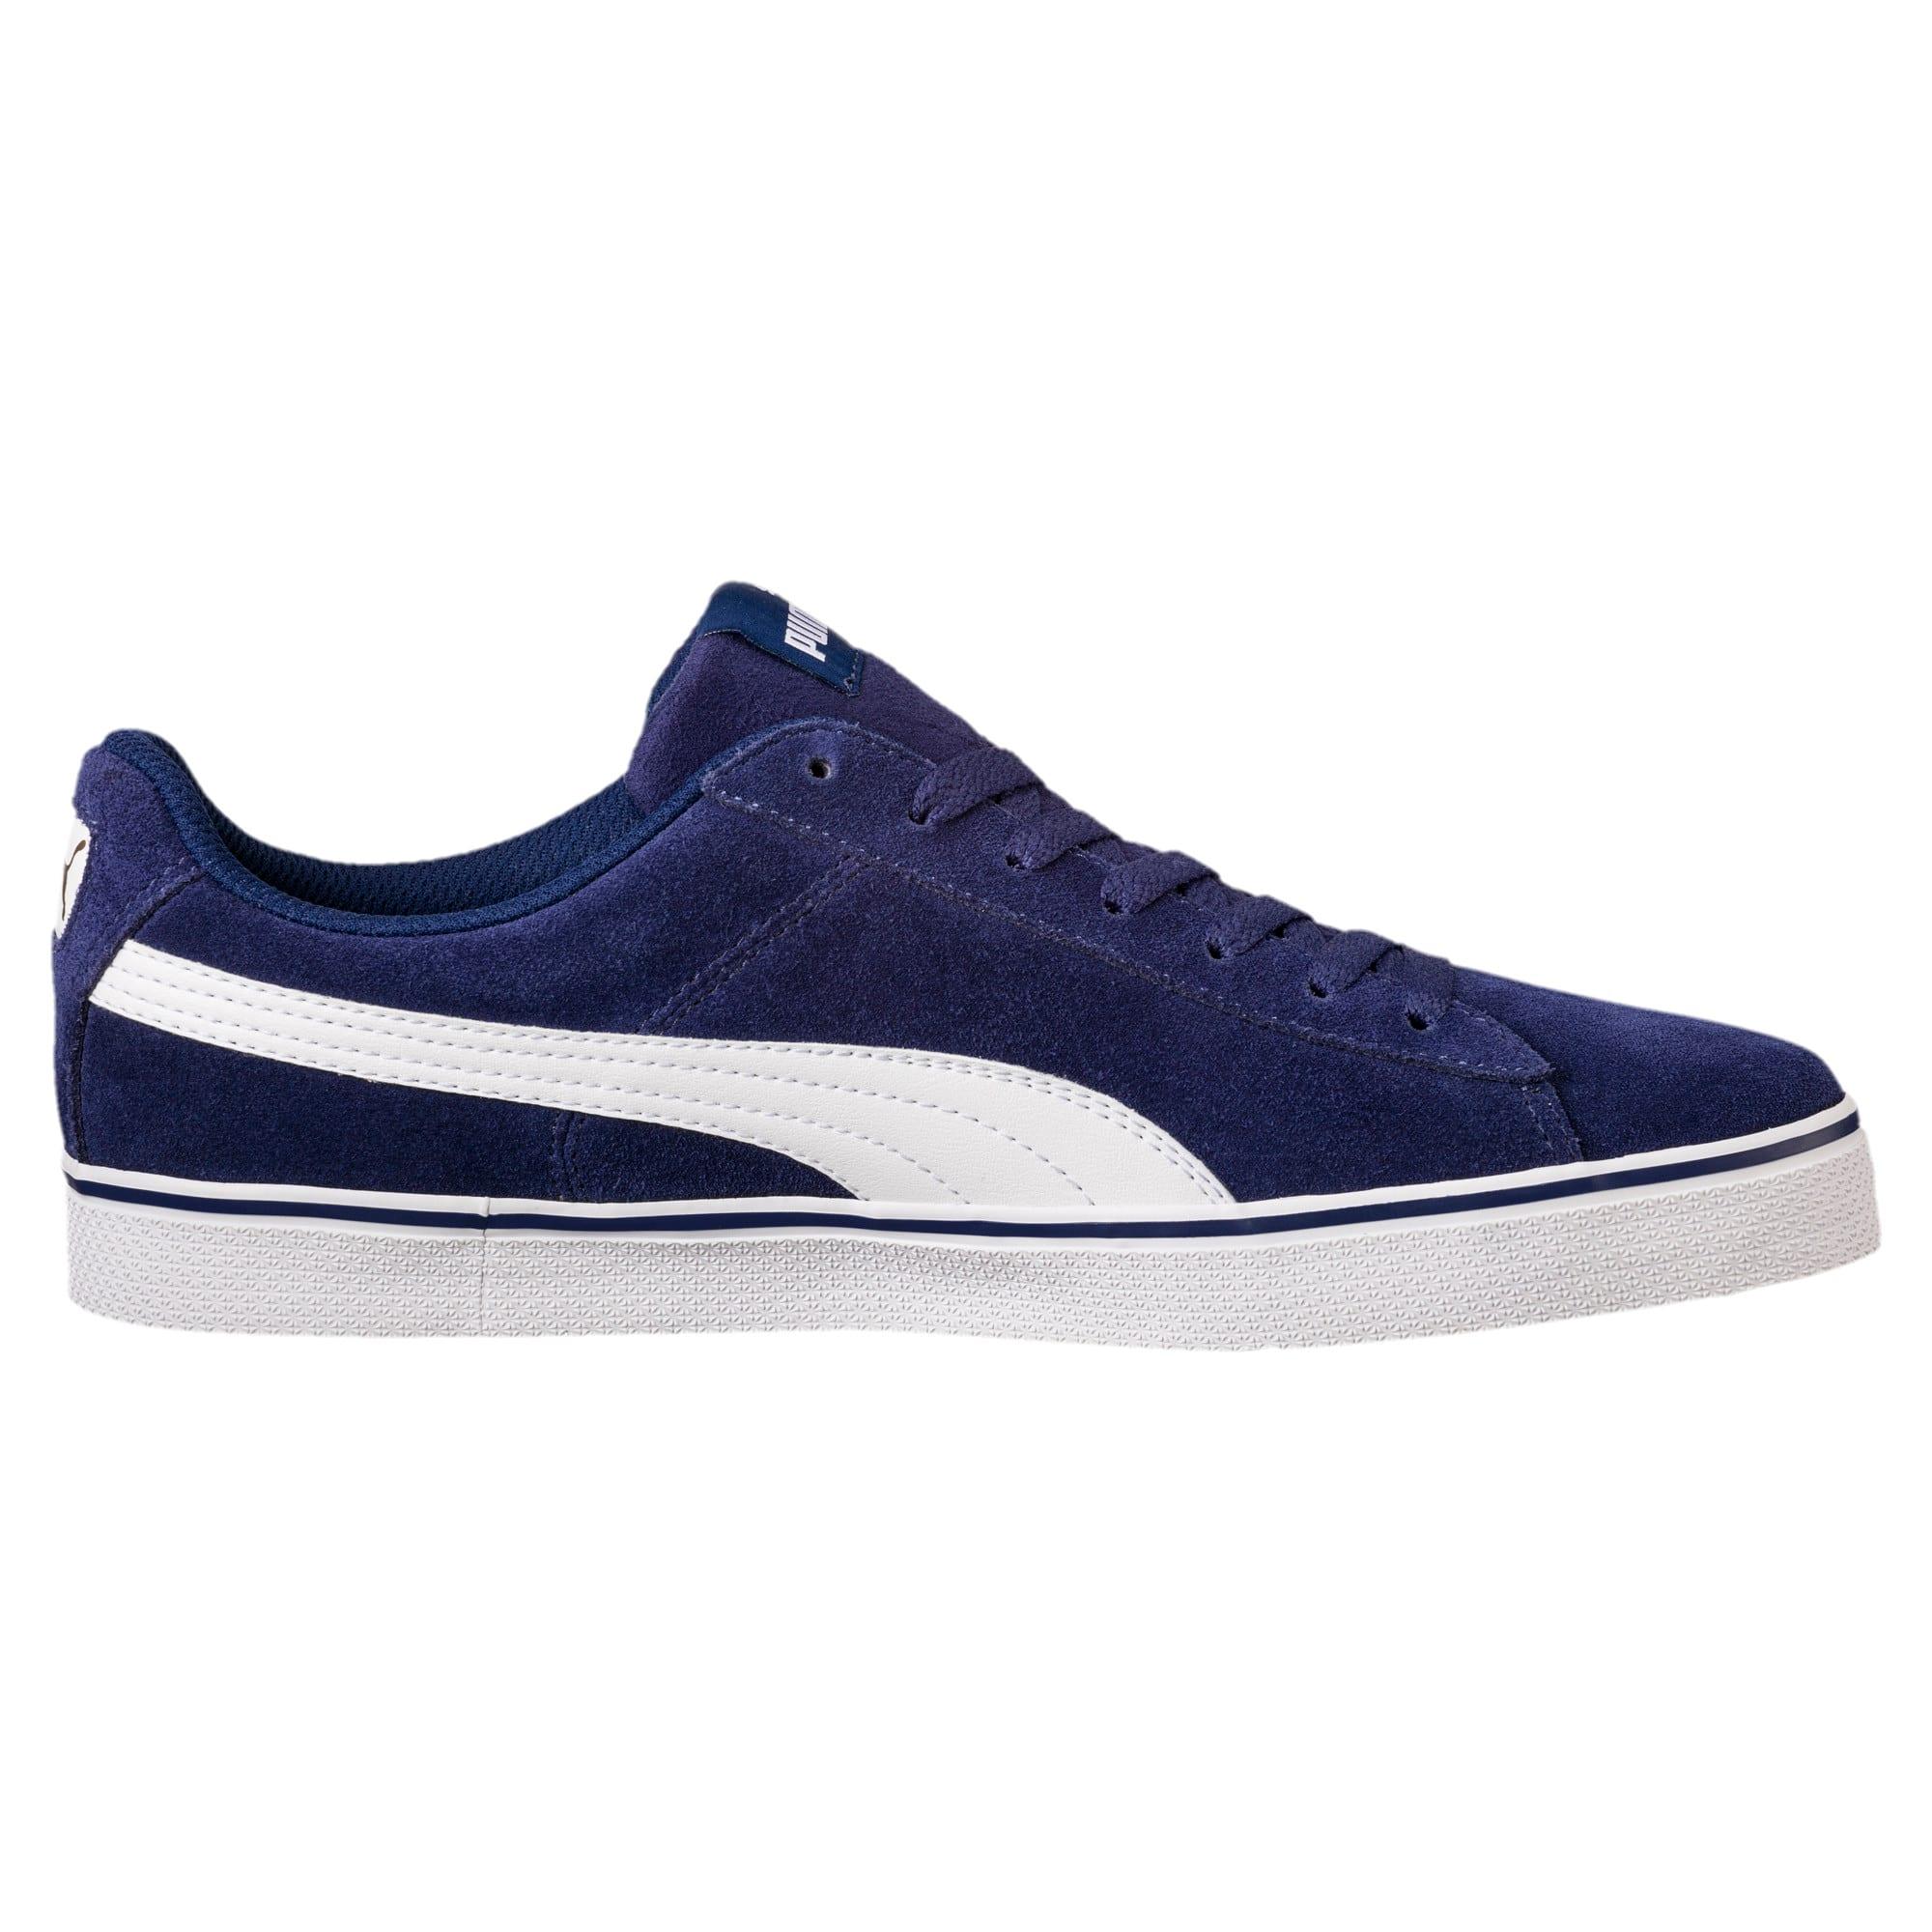 puma 1948 vulc sneakers